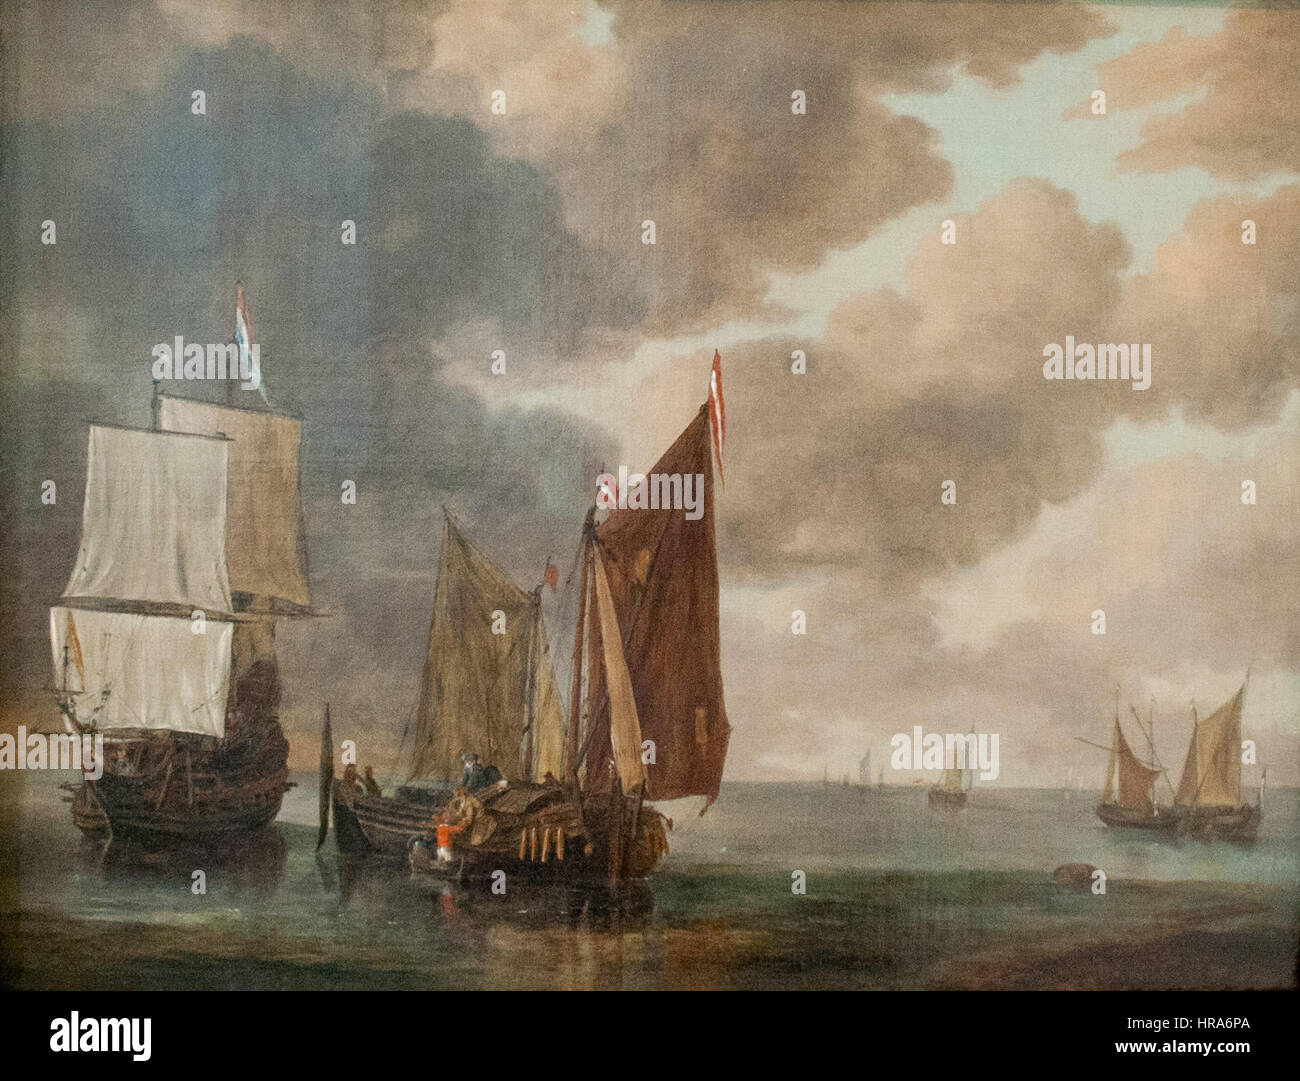 Reinier Nooms - Seascape - Stock Image